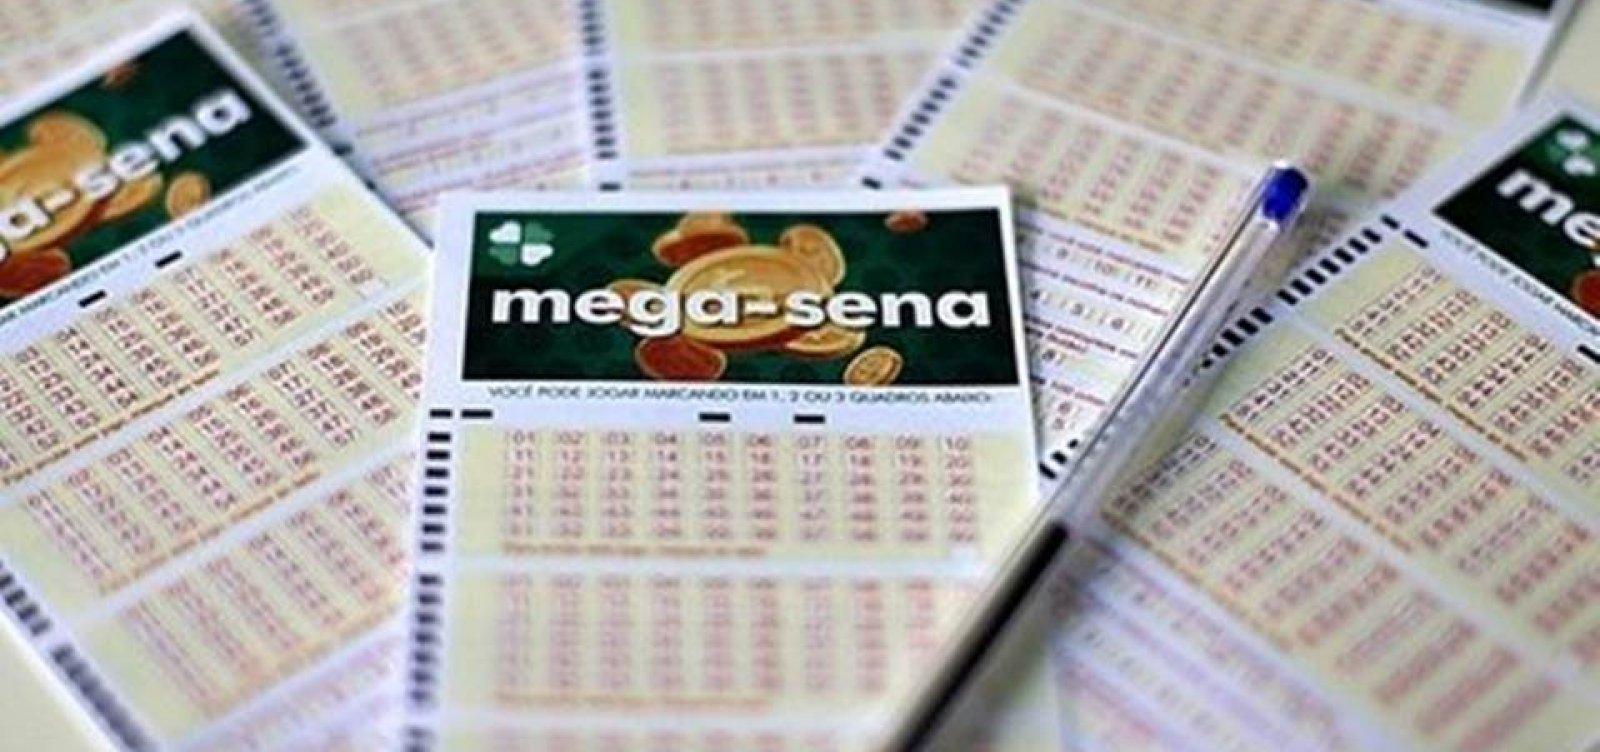 Mega-Sena: ninguém acerta 6 dezenas e prêmio deve ir a R$ 23 milhões